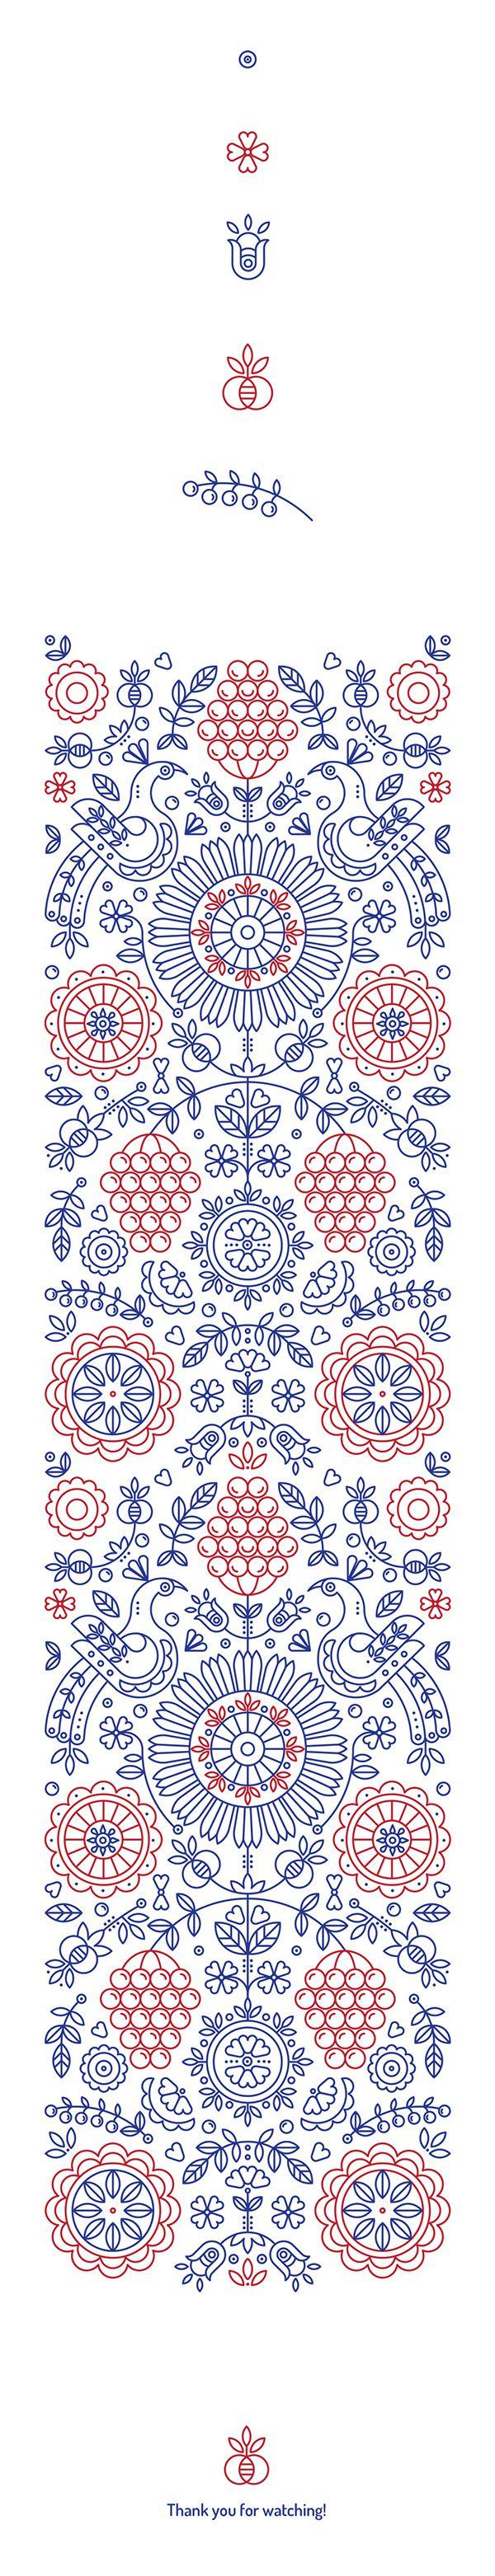 #pattern #illustration